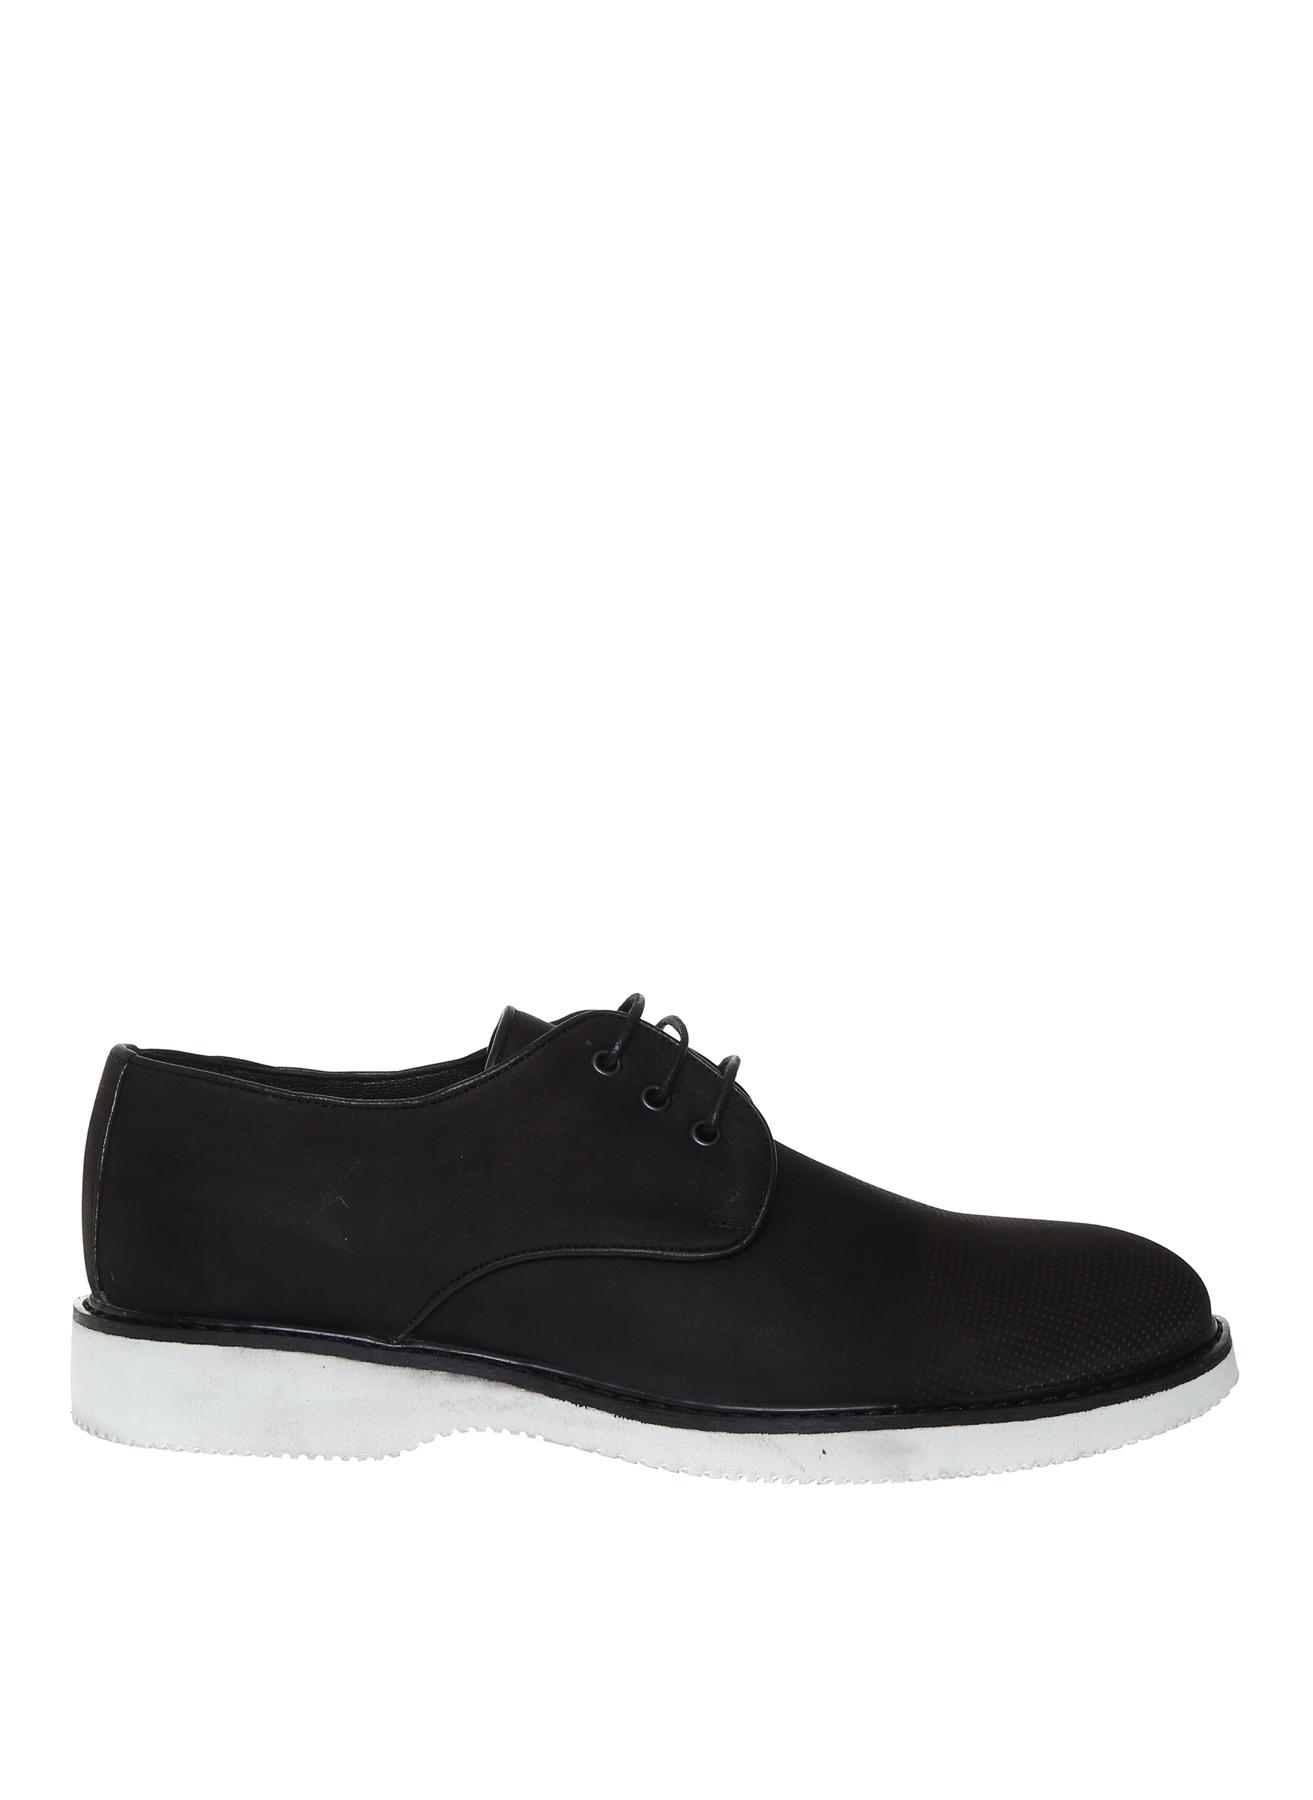 40 Siyah Fabrika Erkek Nubuk Klasik Ayakkabı 5001909947001 & Çanta